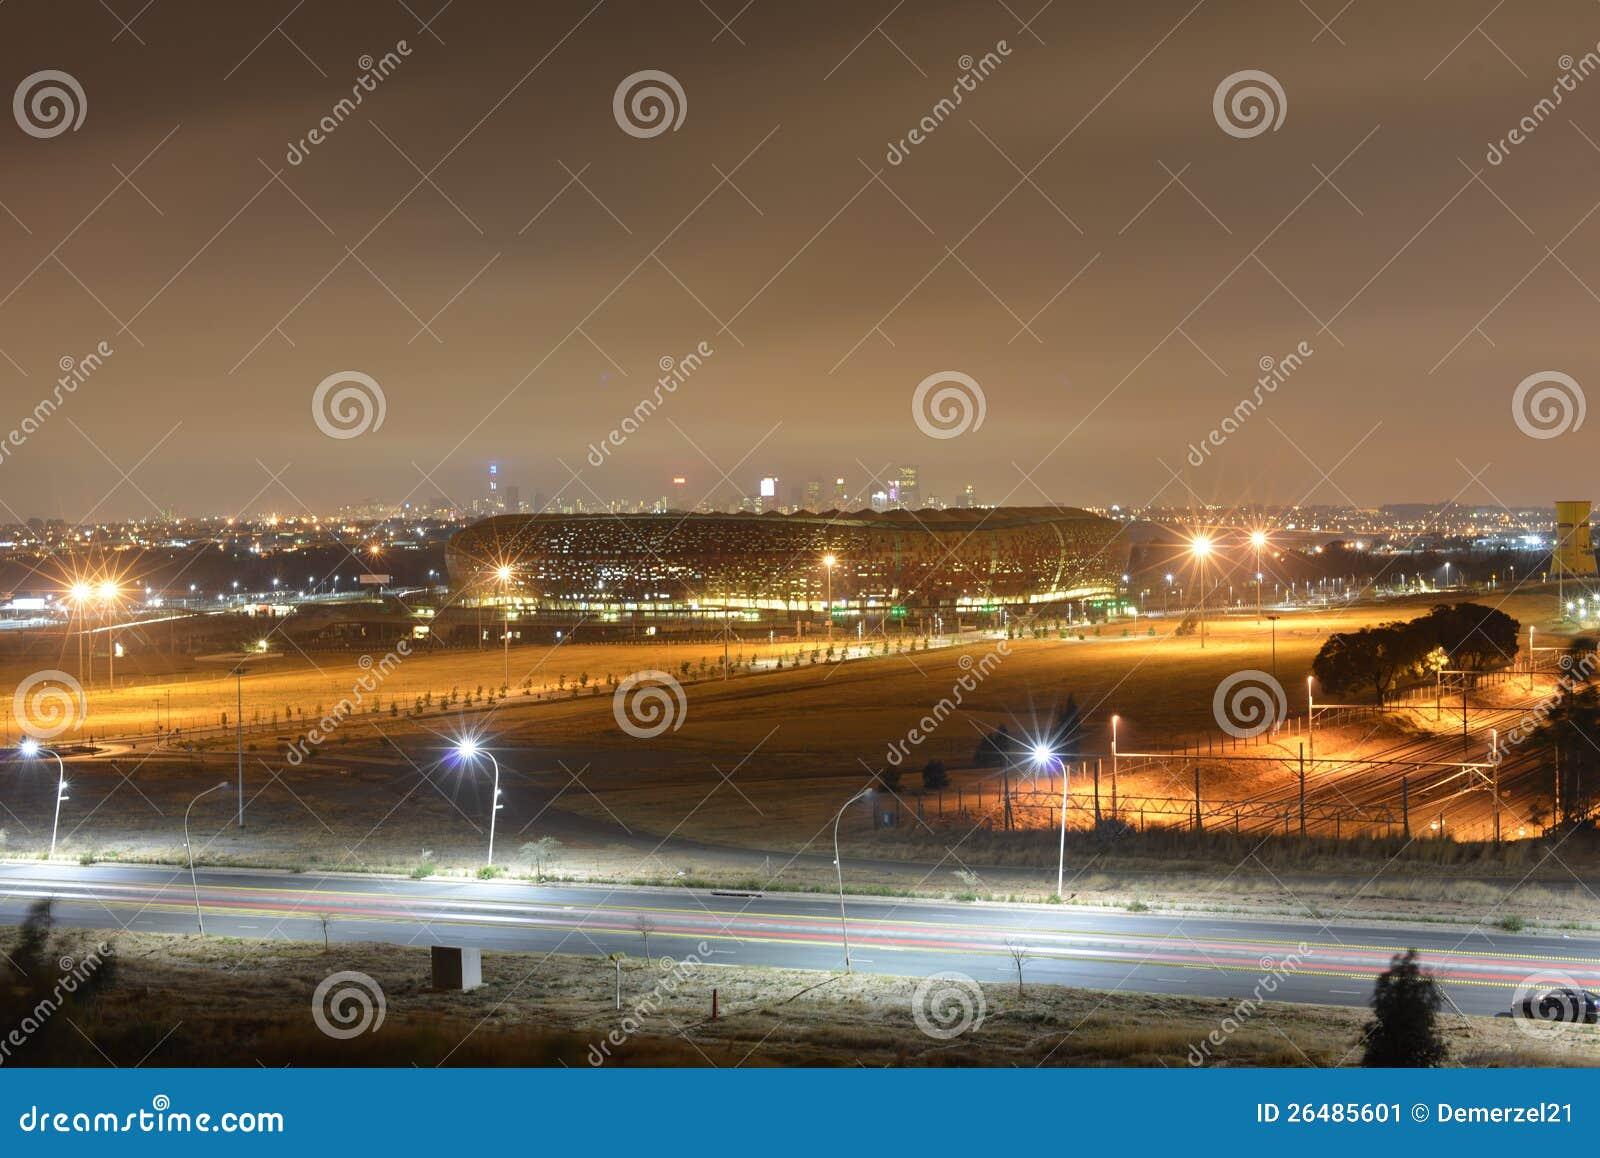 Sandton city fnb forex